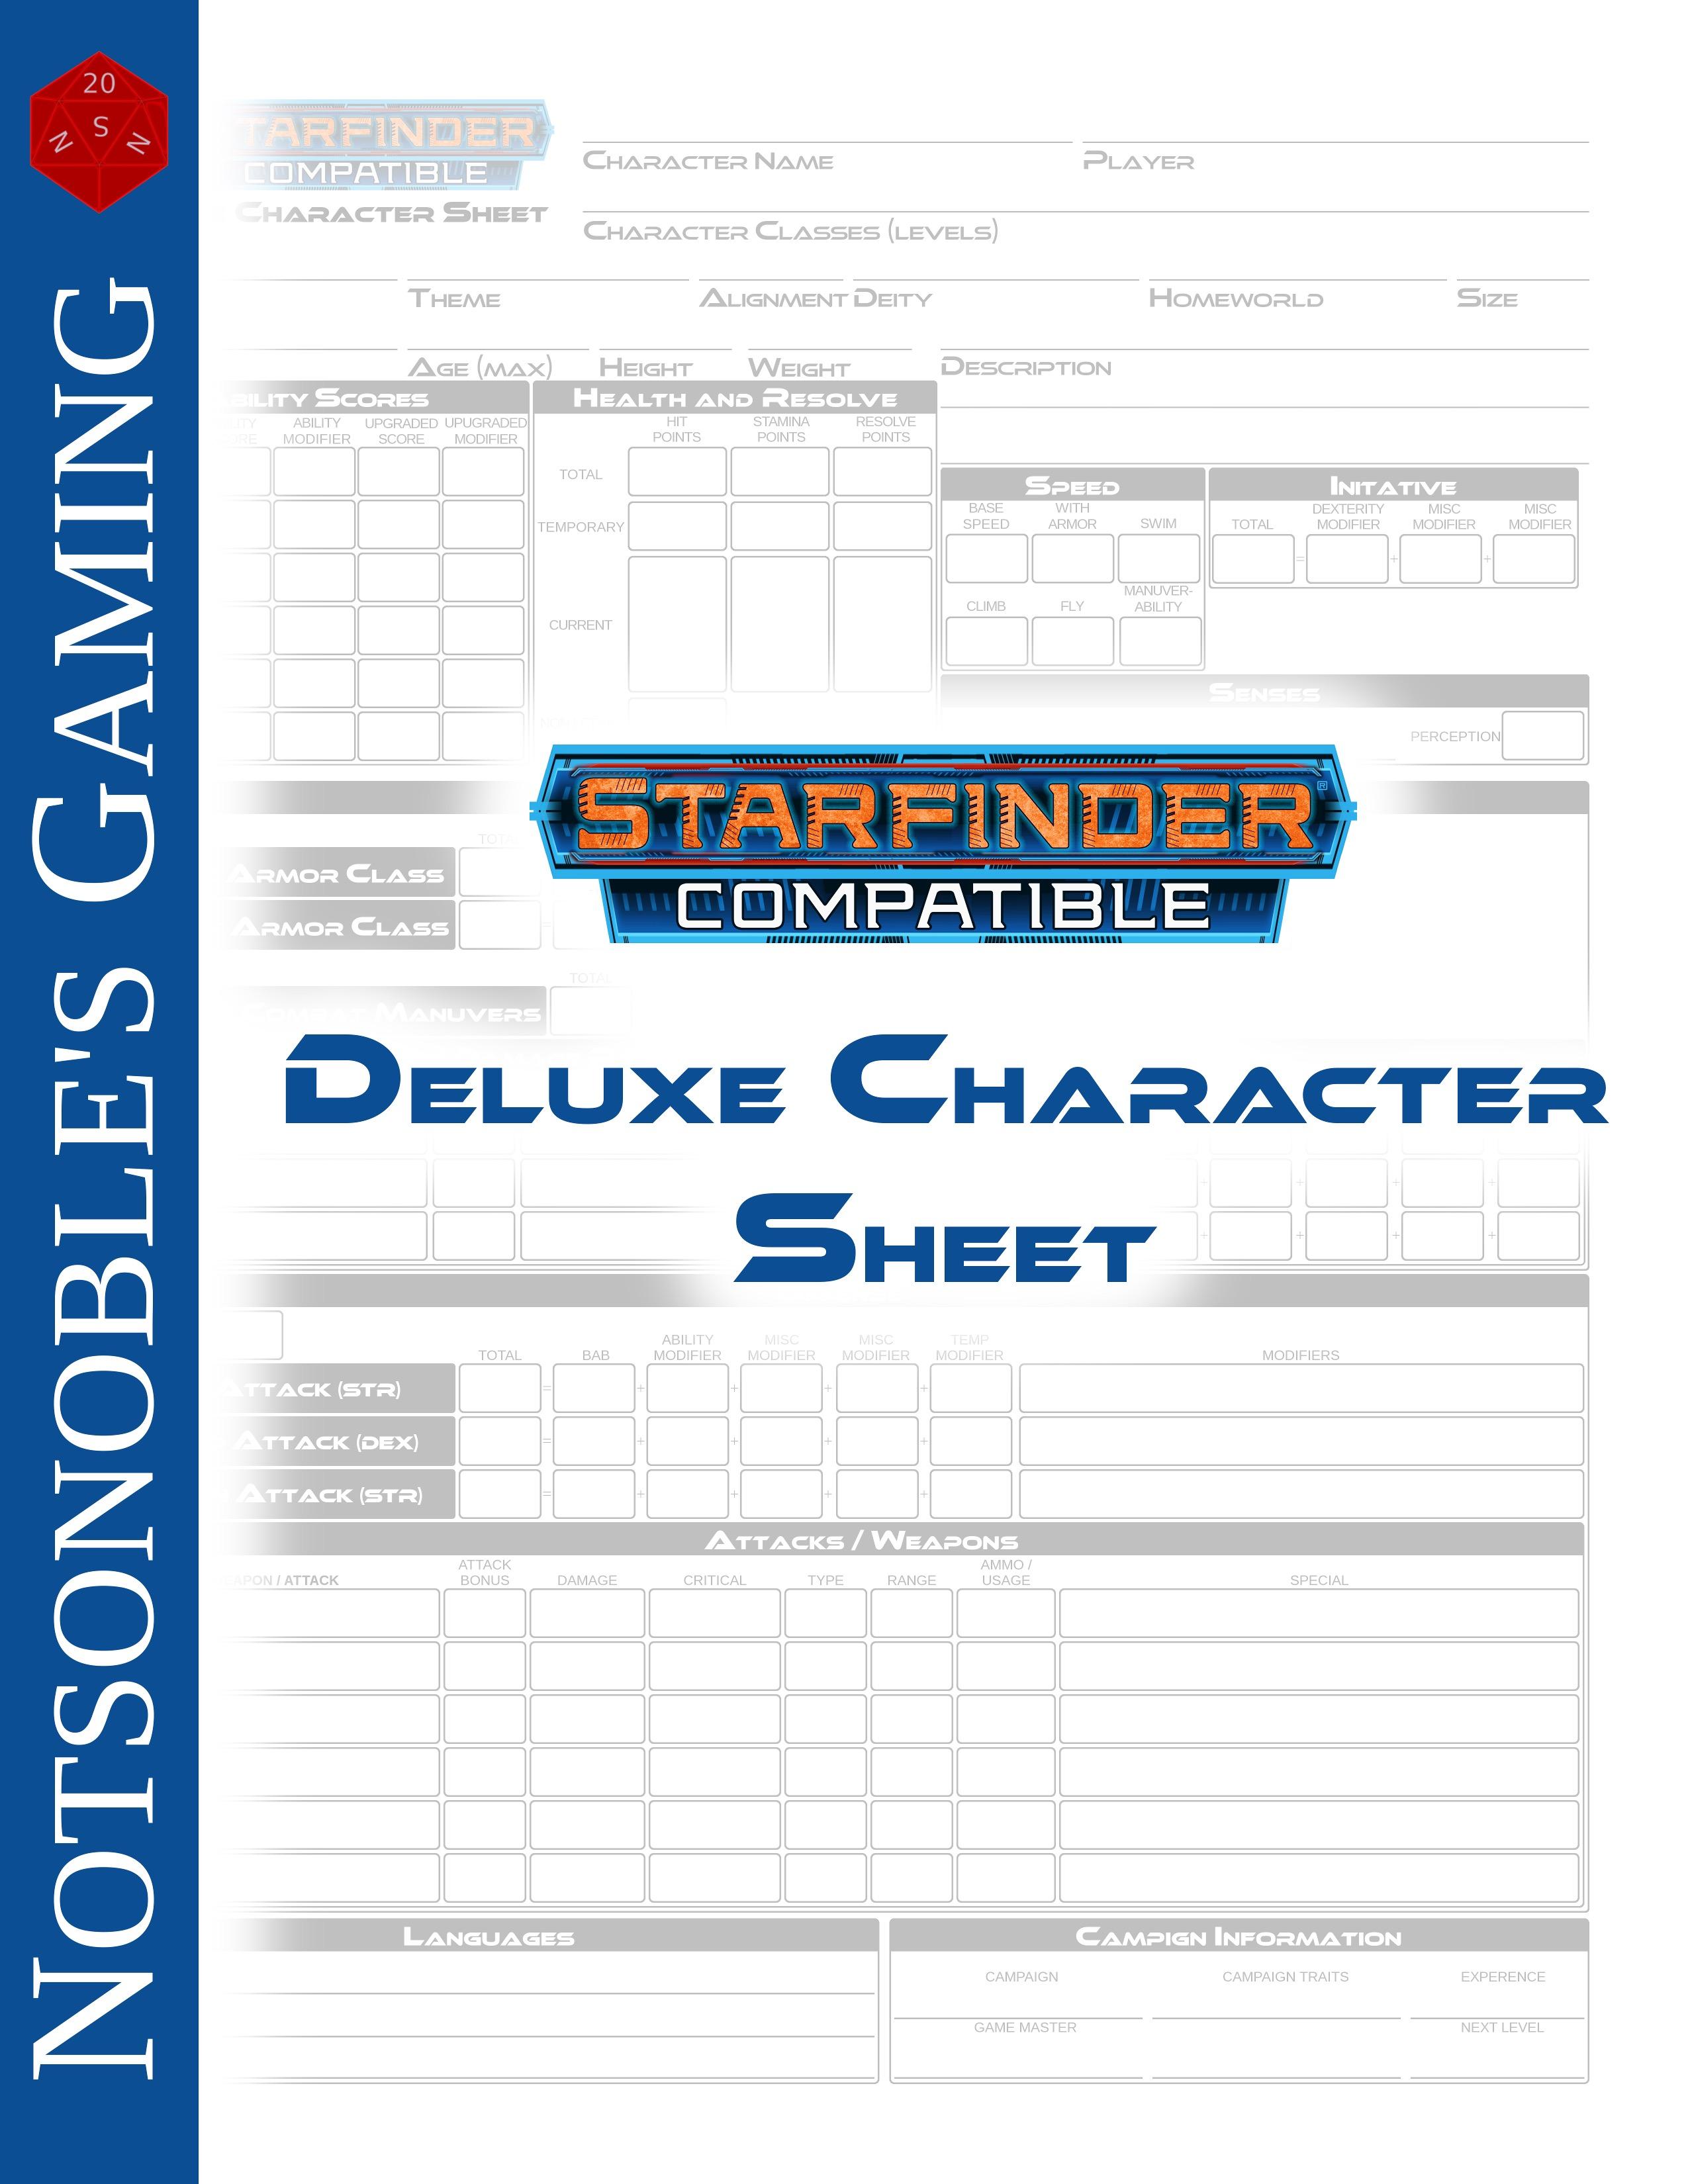 paizo com - Deluxe Character Sheet (SFRPG) PDF